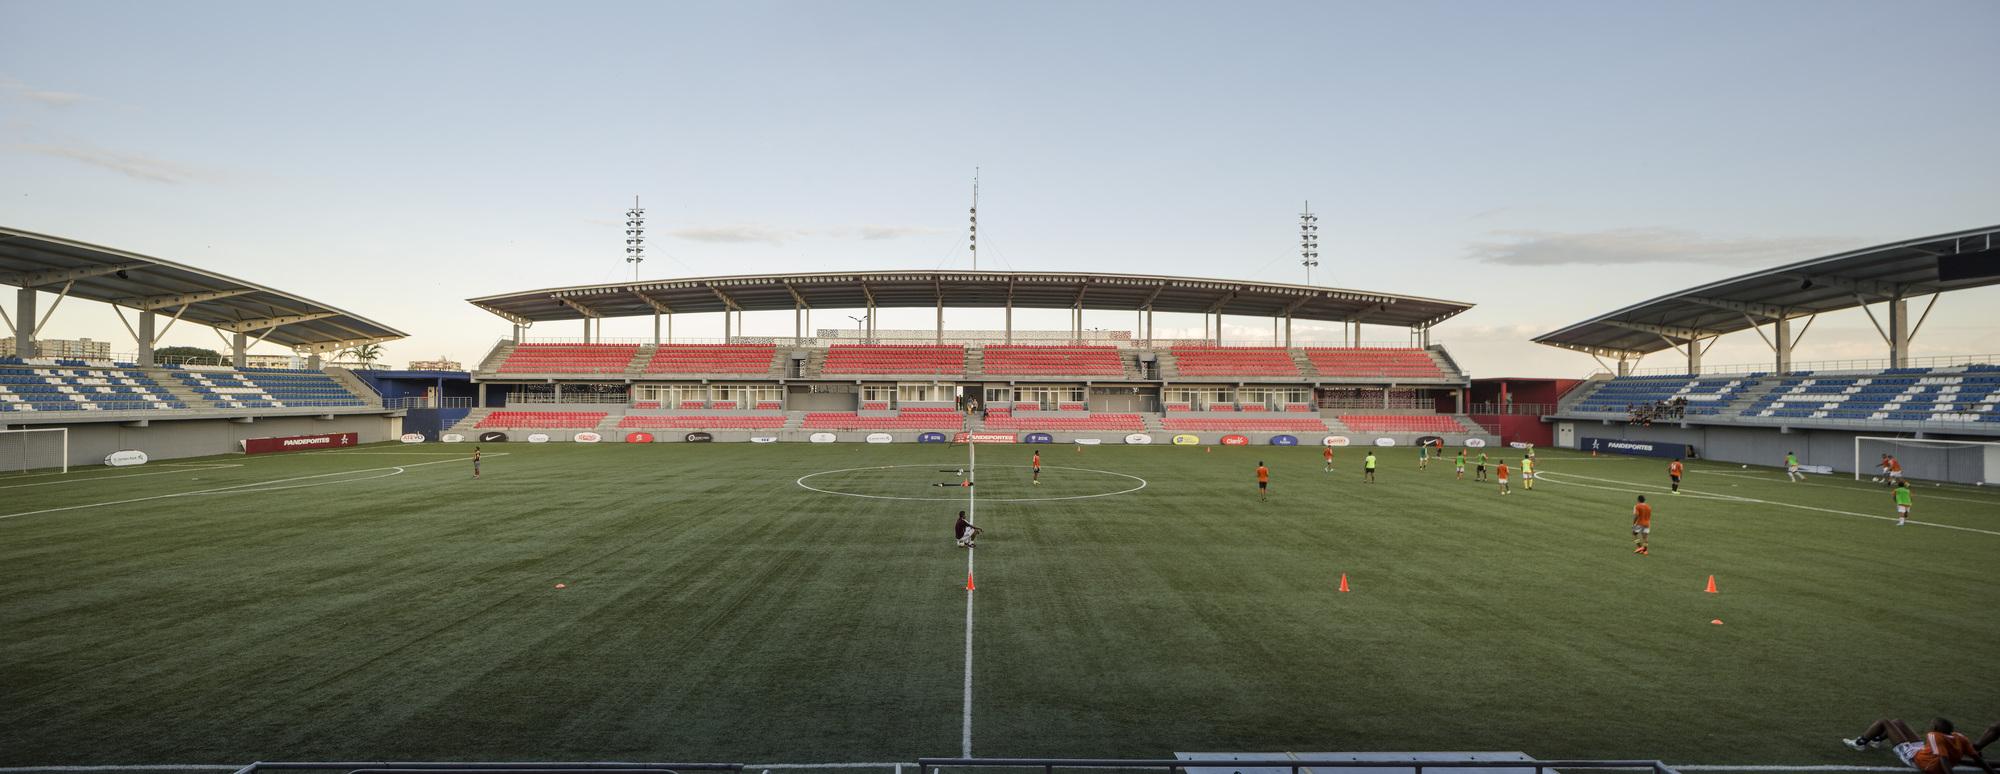 Maracan 225 Stadium Panam 225 Grupo Suma Archdaily